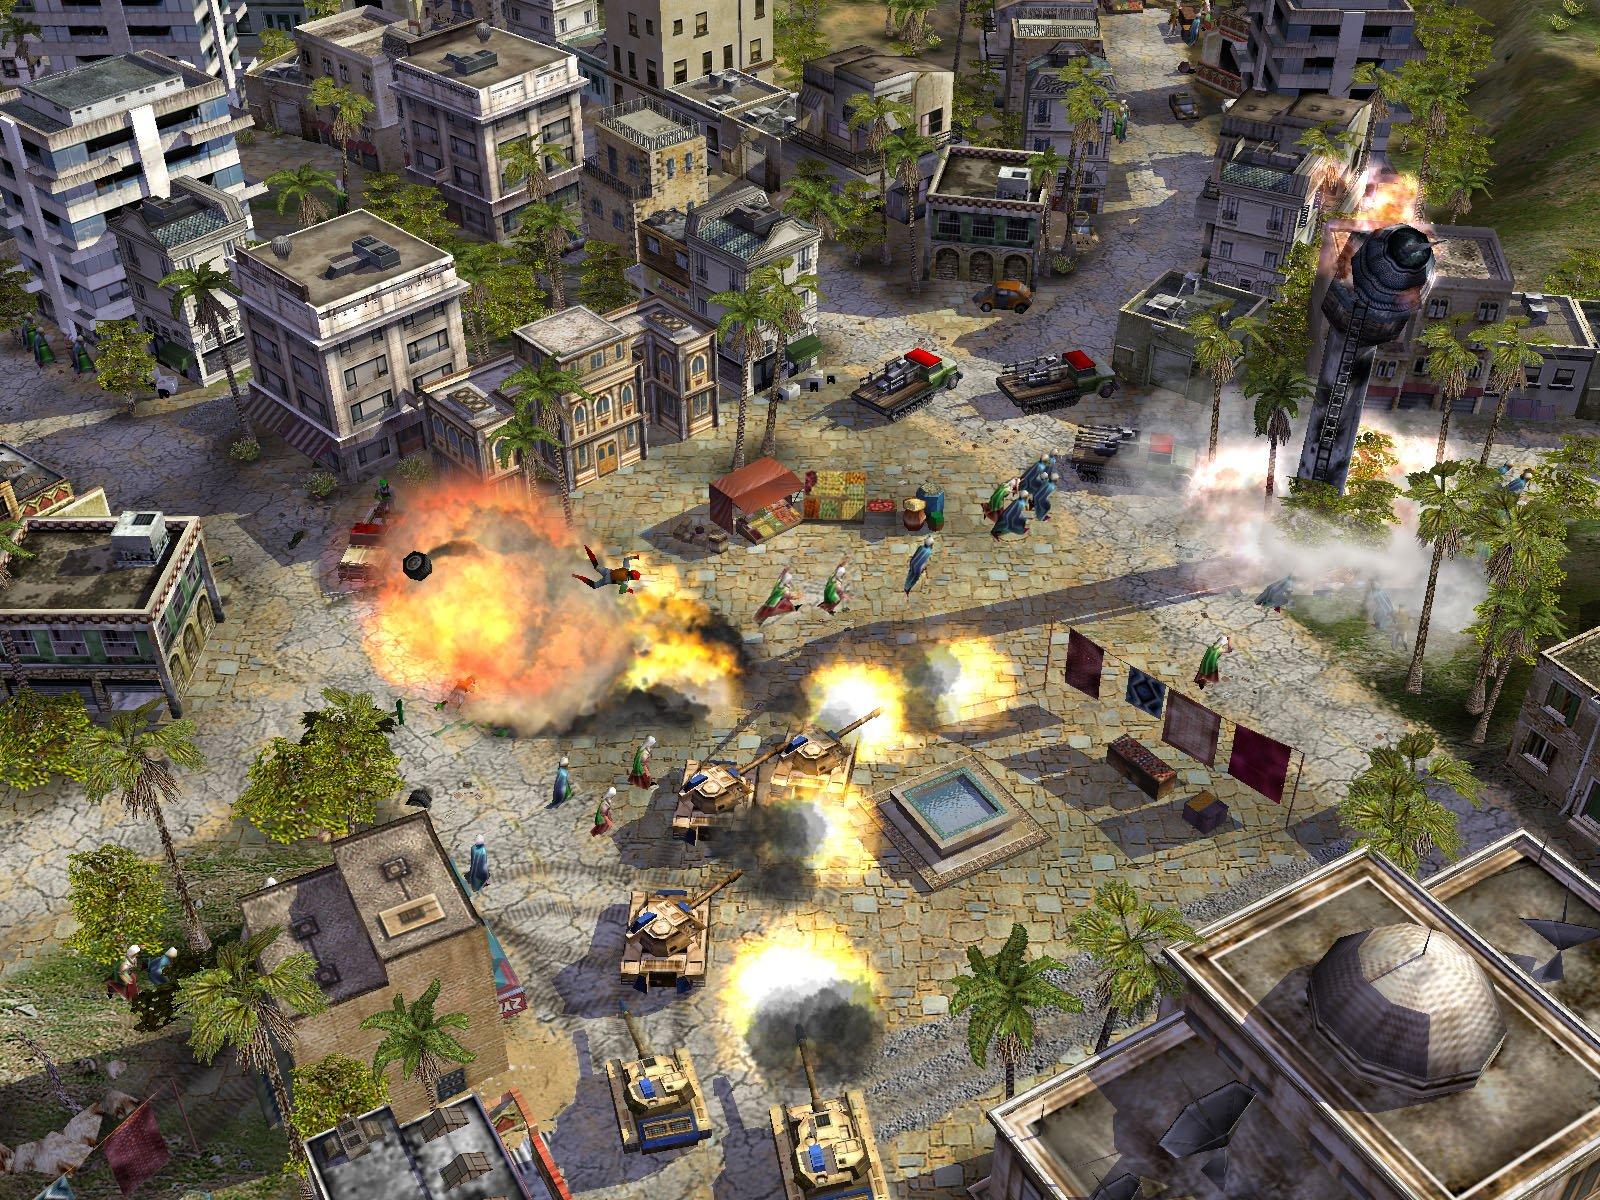 https://www.bluesnews.com/screenshots/games/ccgenerals/20020515/blackhawk.jpg